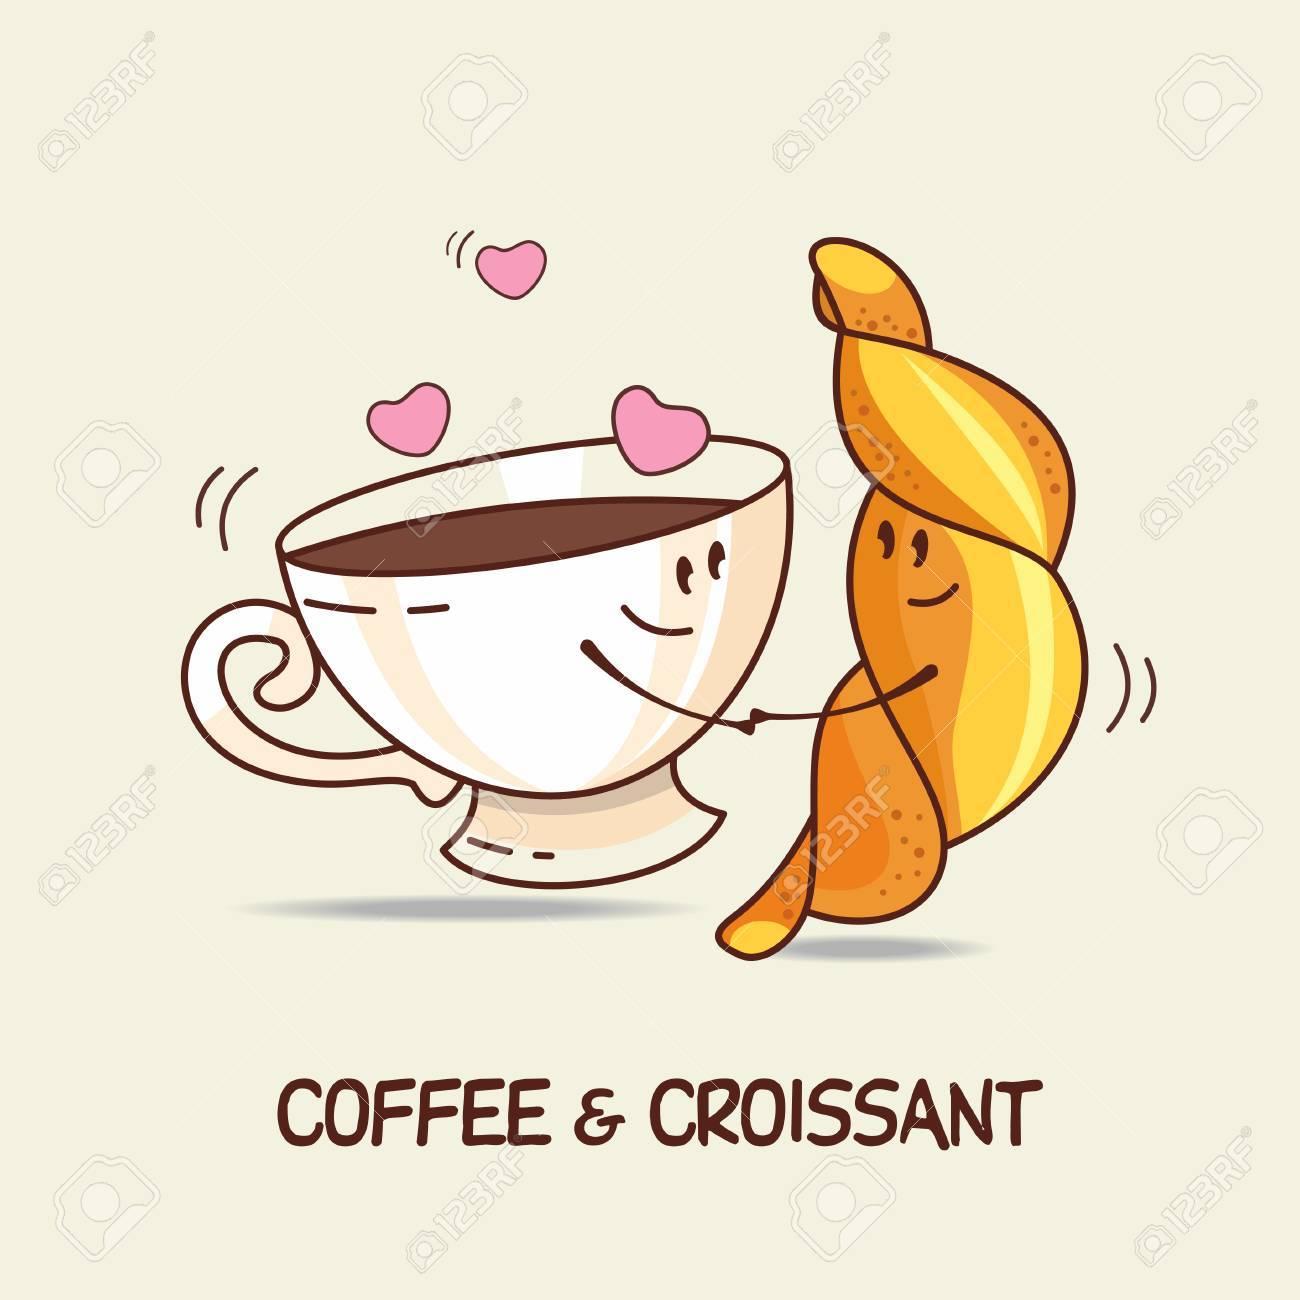 Kaffee Und Croissant Liebe Fur Immer Comic Cartoon Vektor